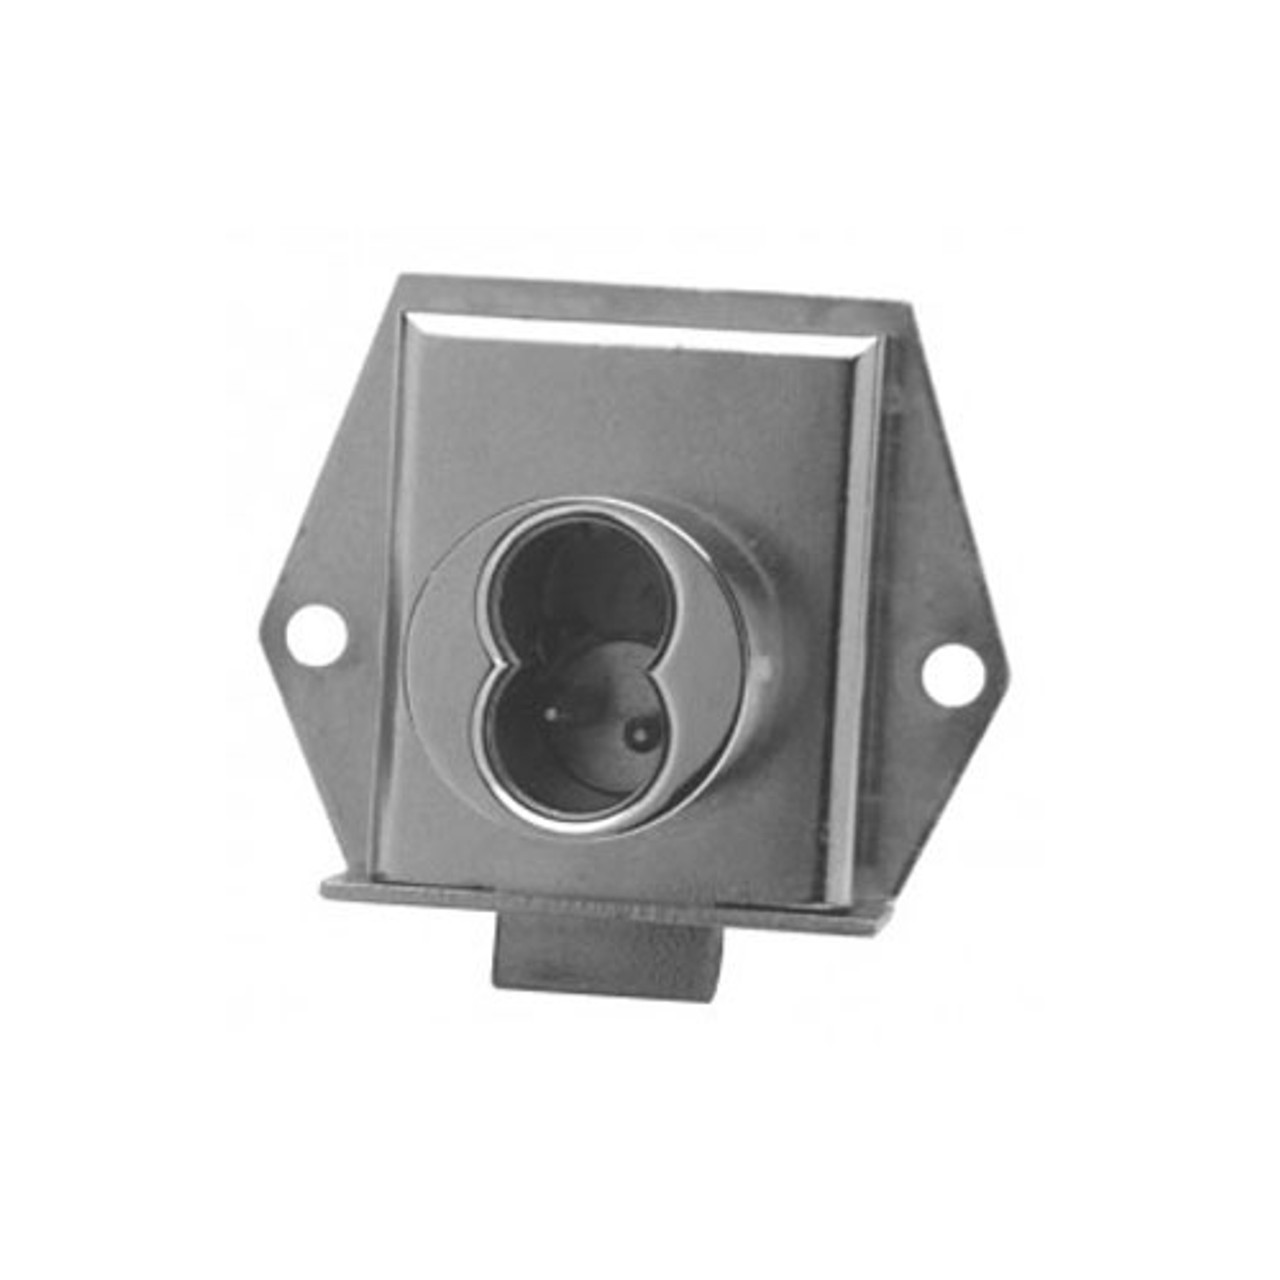 Olympus 725ML-DW-VH-26D Cabinet Locks in Satin Chrome Finish